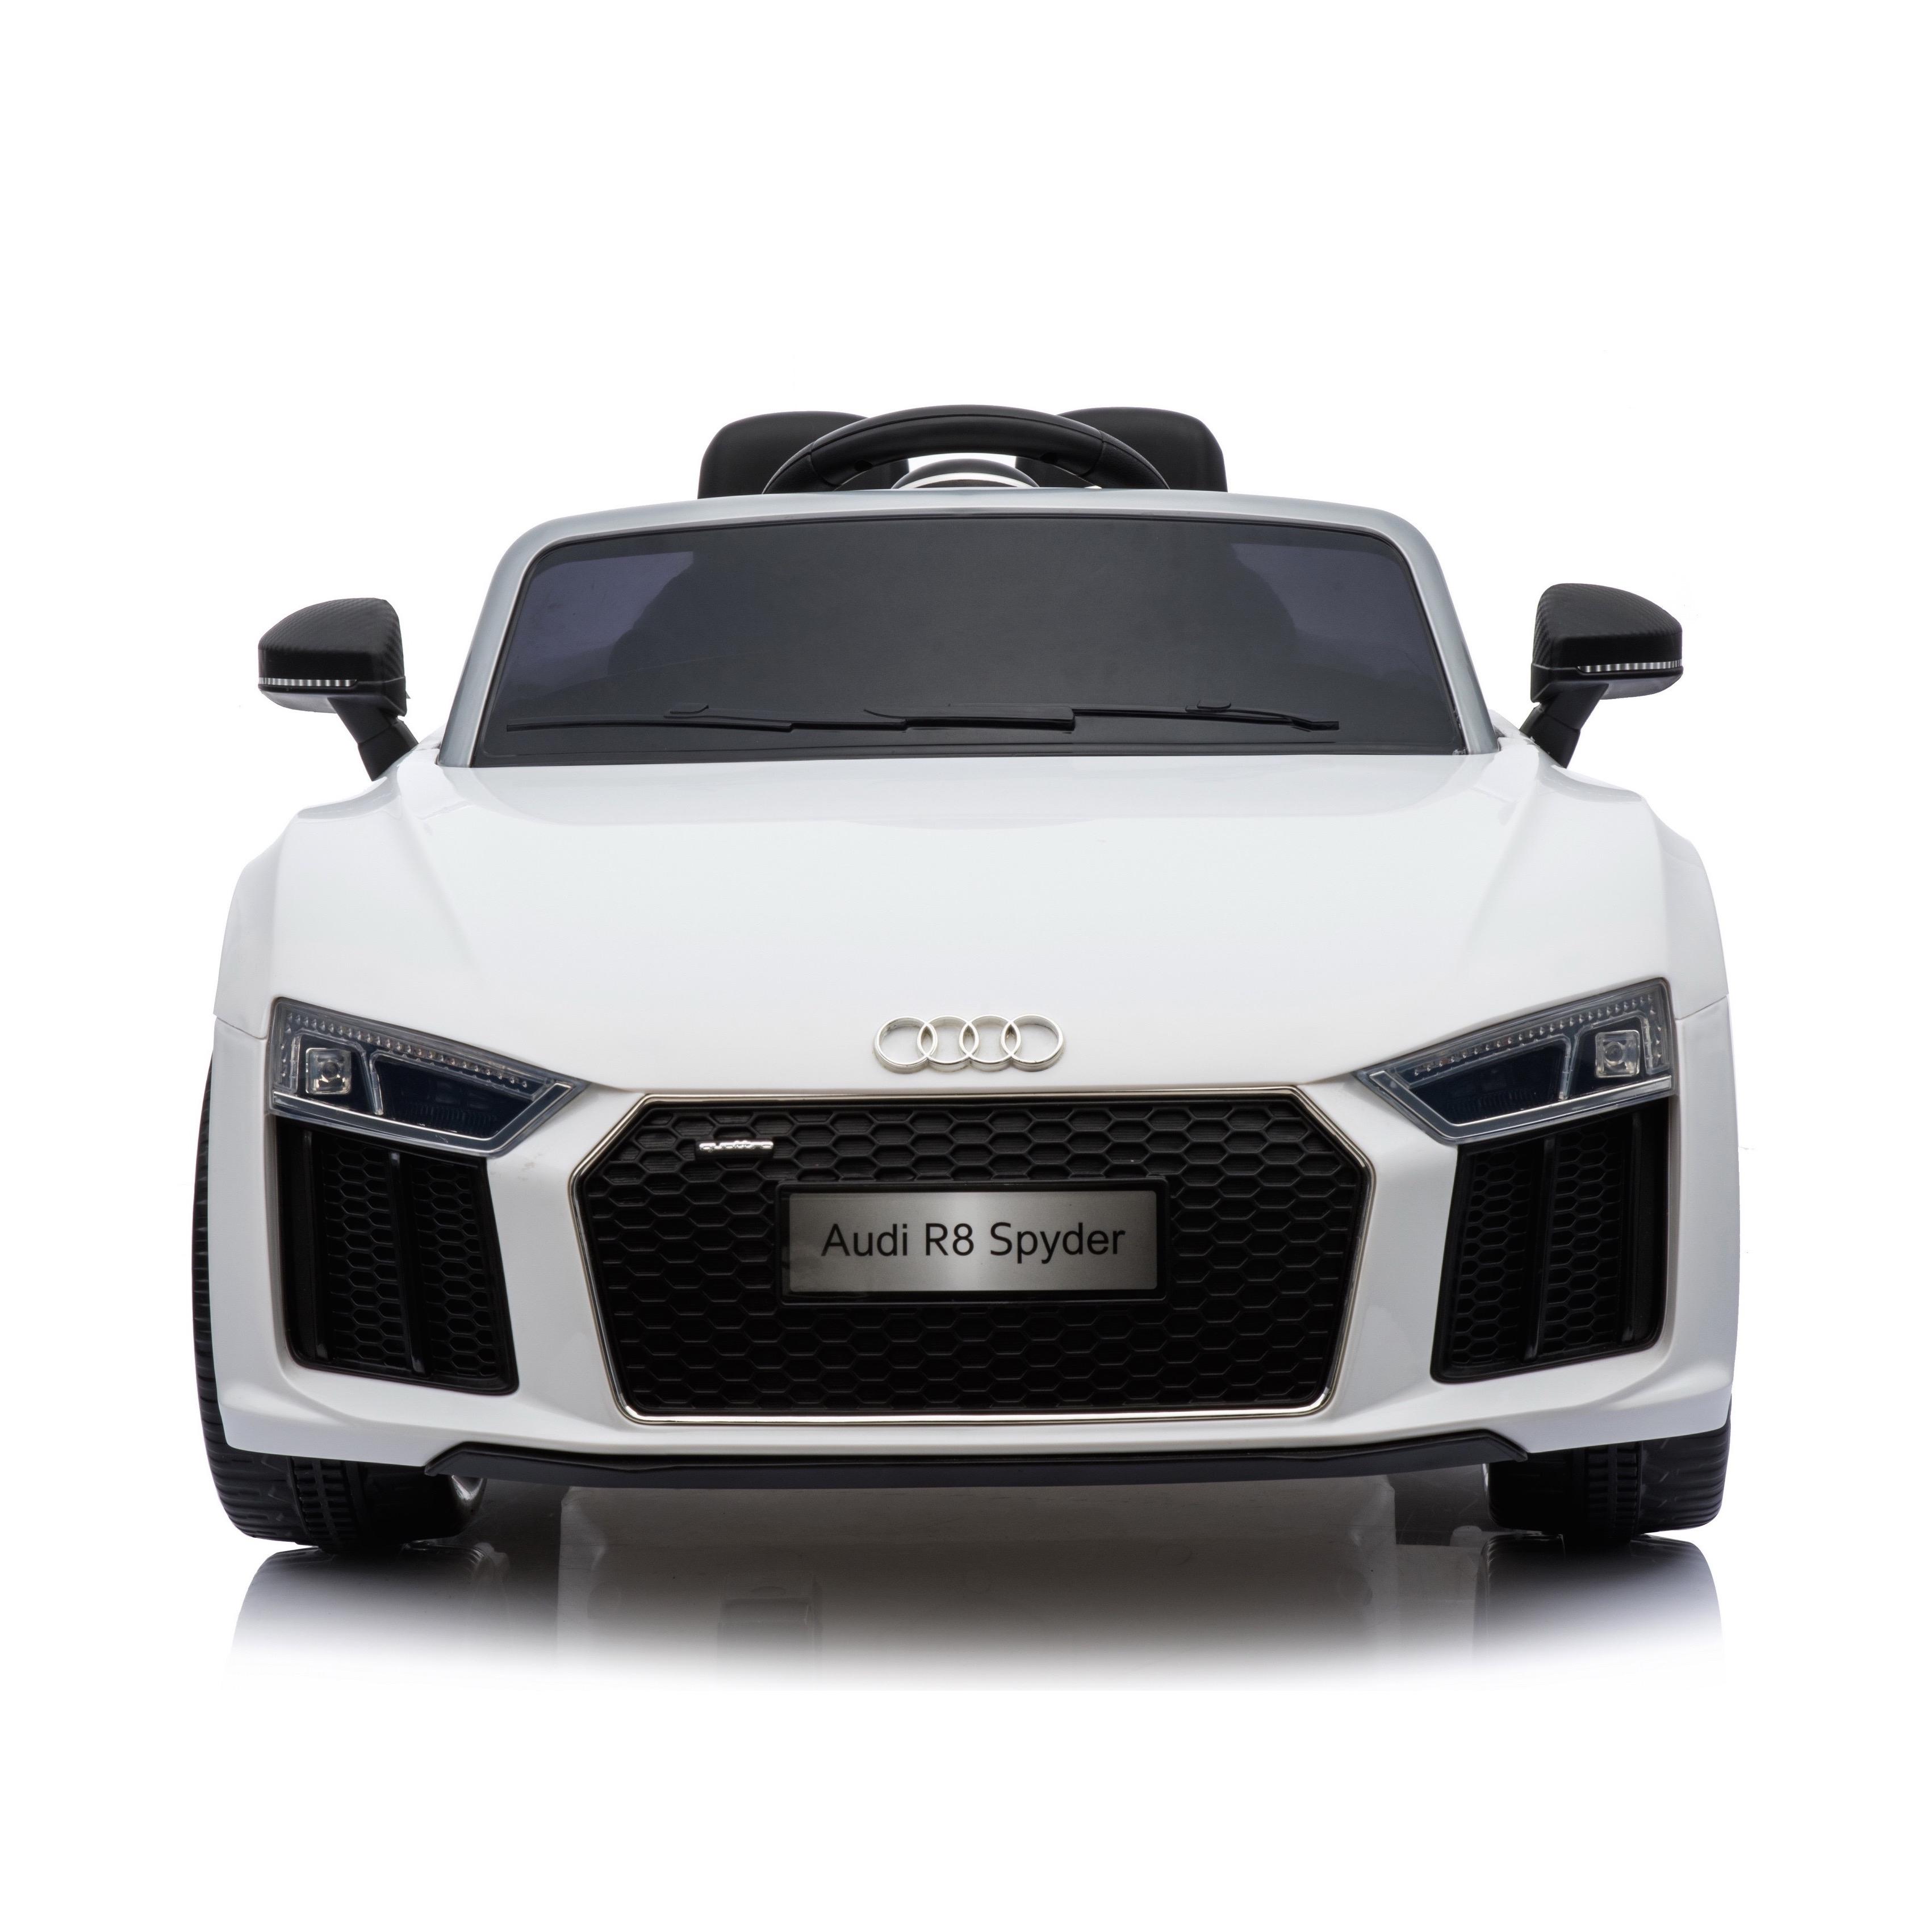 Compact Licensed Audi R Spyder V Childrens Electric Ride On Car - White audi r8